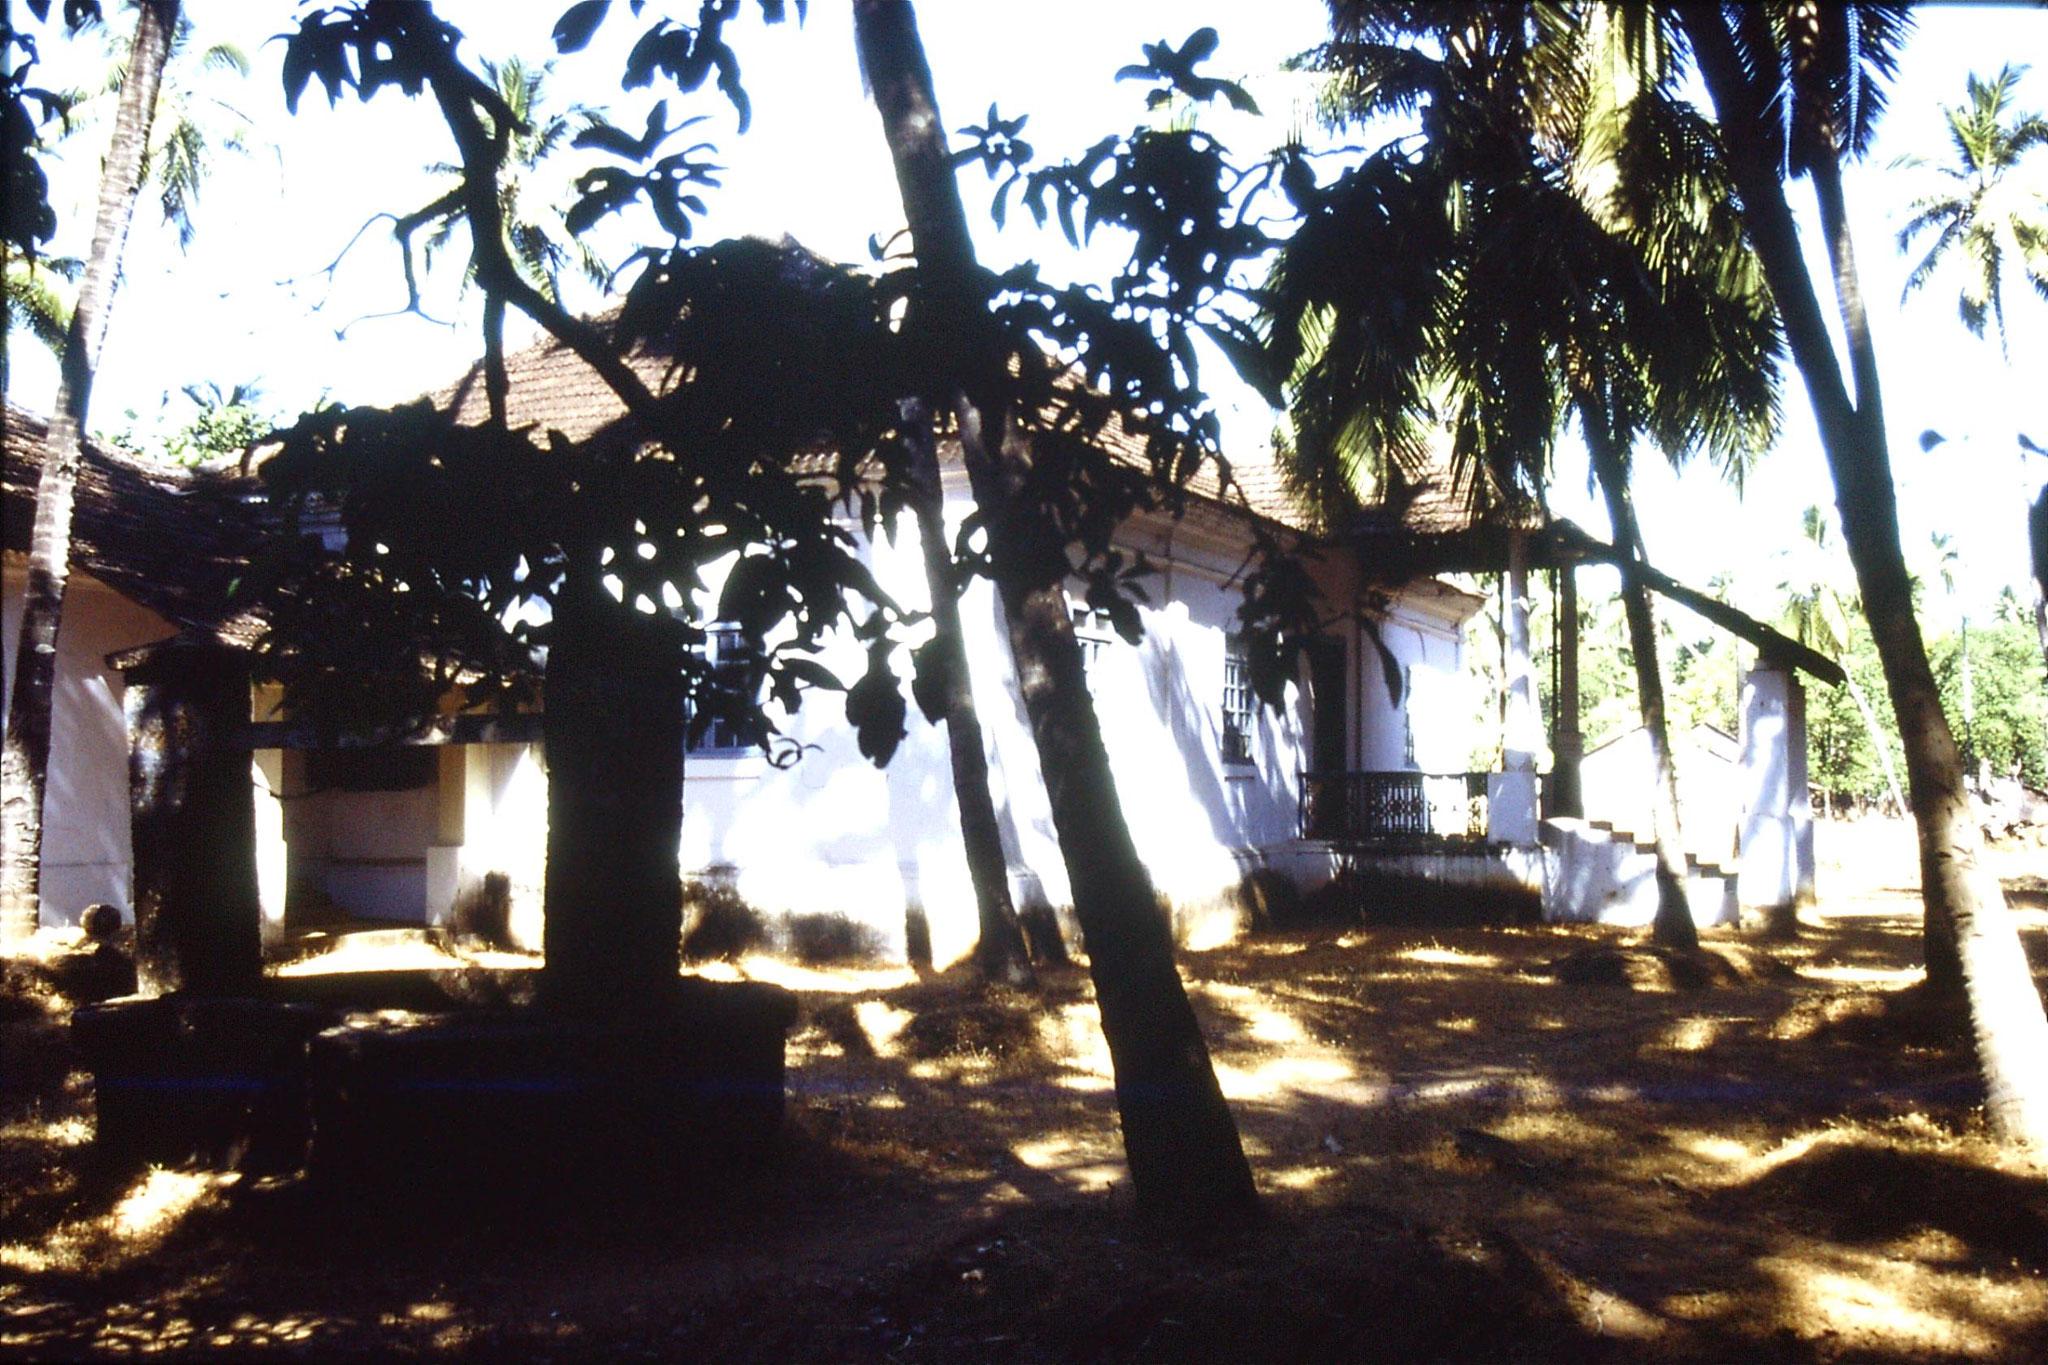 3/1/1990: 30: Candolim, Rodriguez villa and well